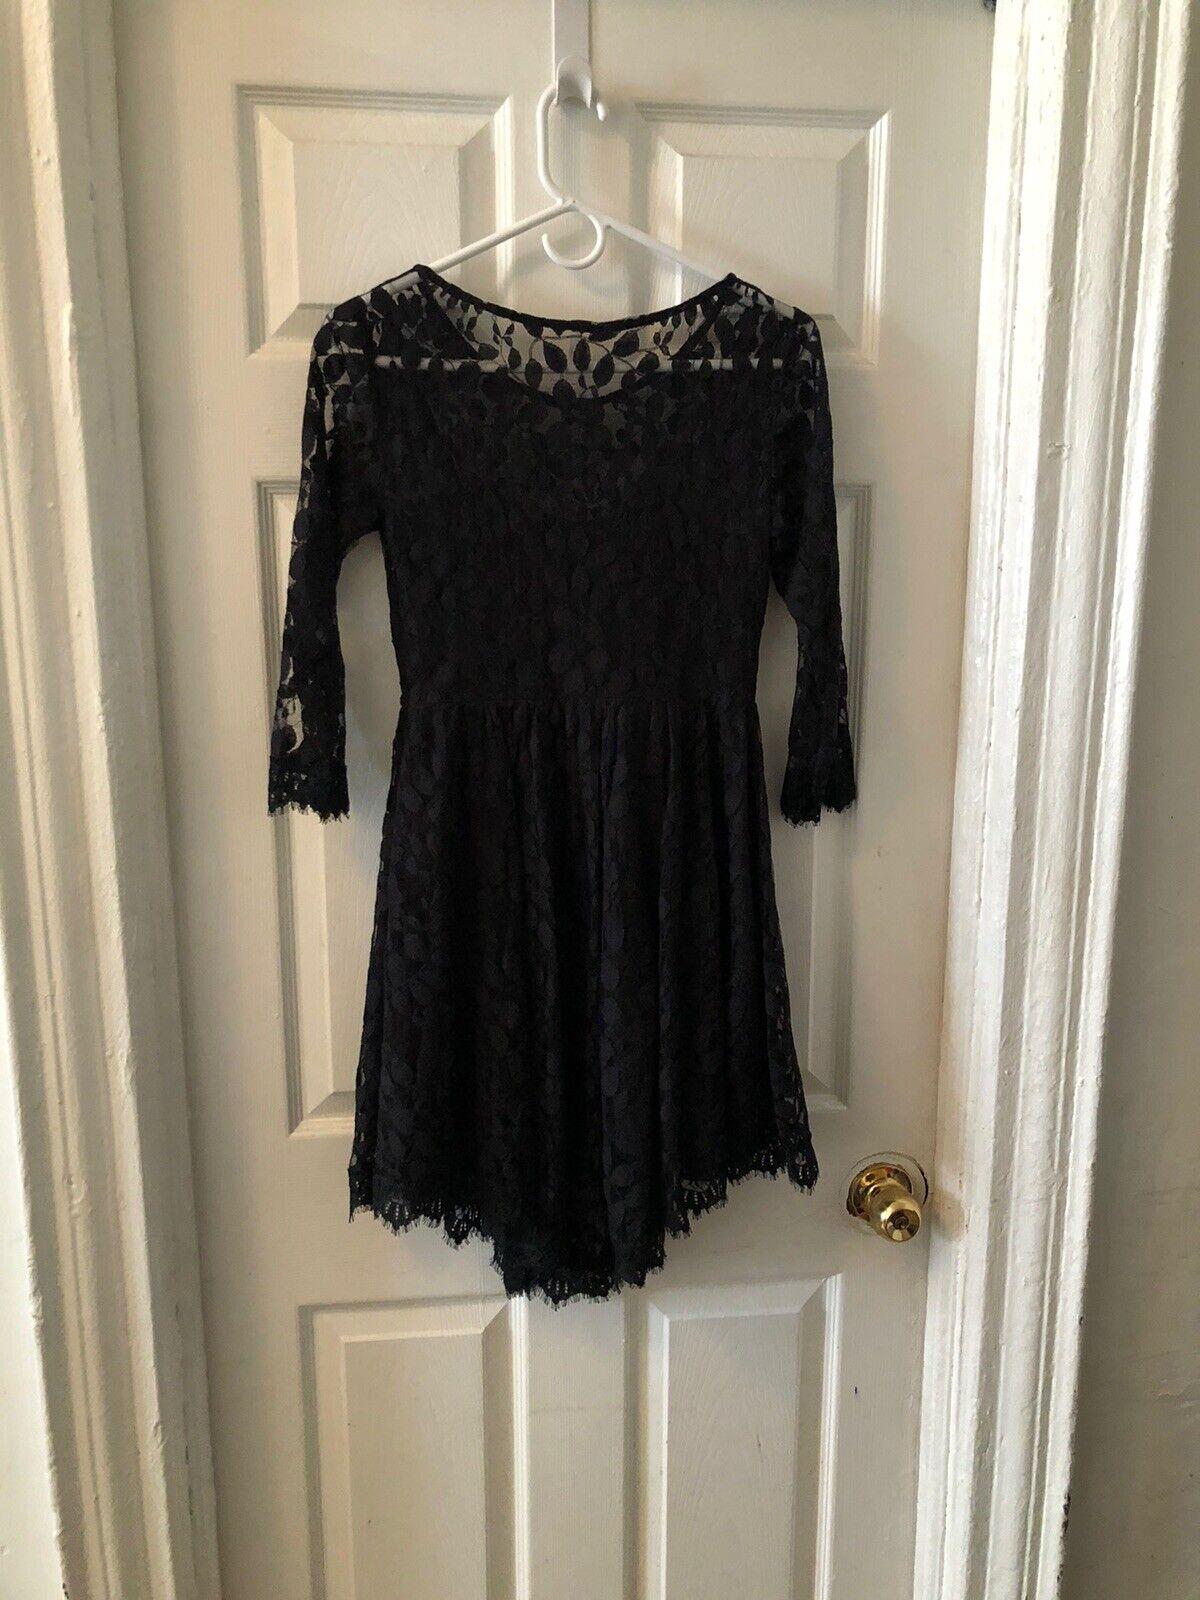 Free People Black Dress - image 5